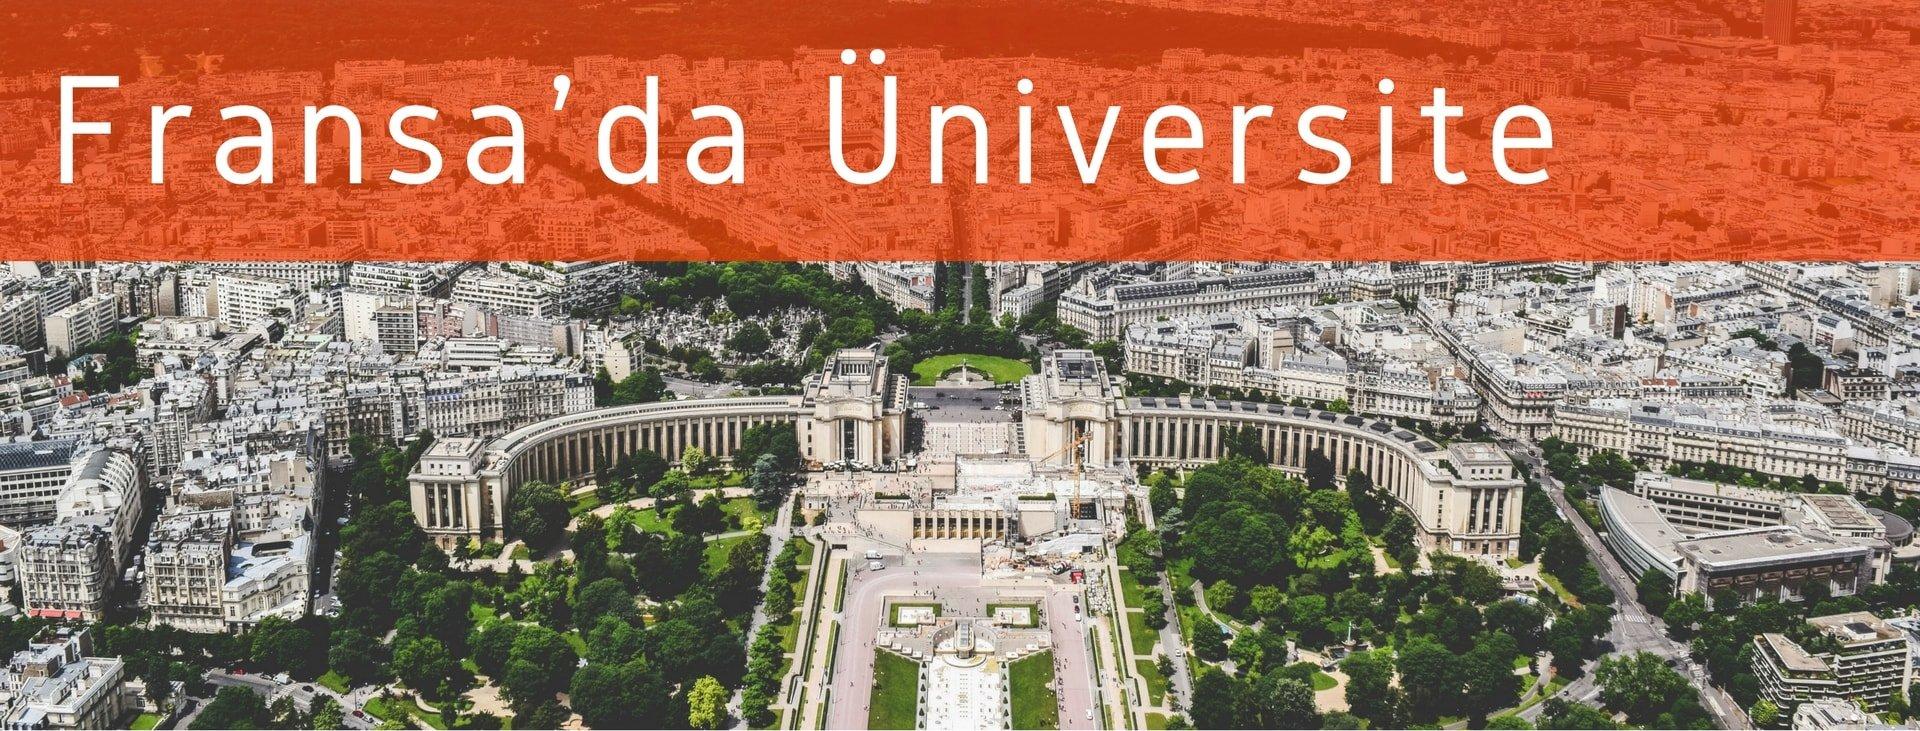 fransada-universite